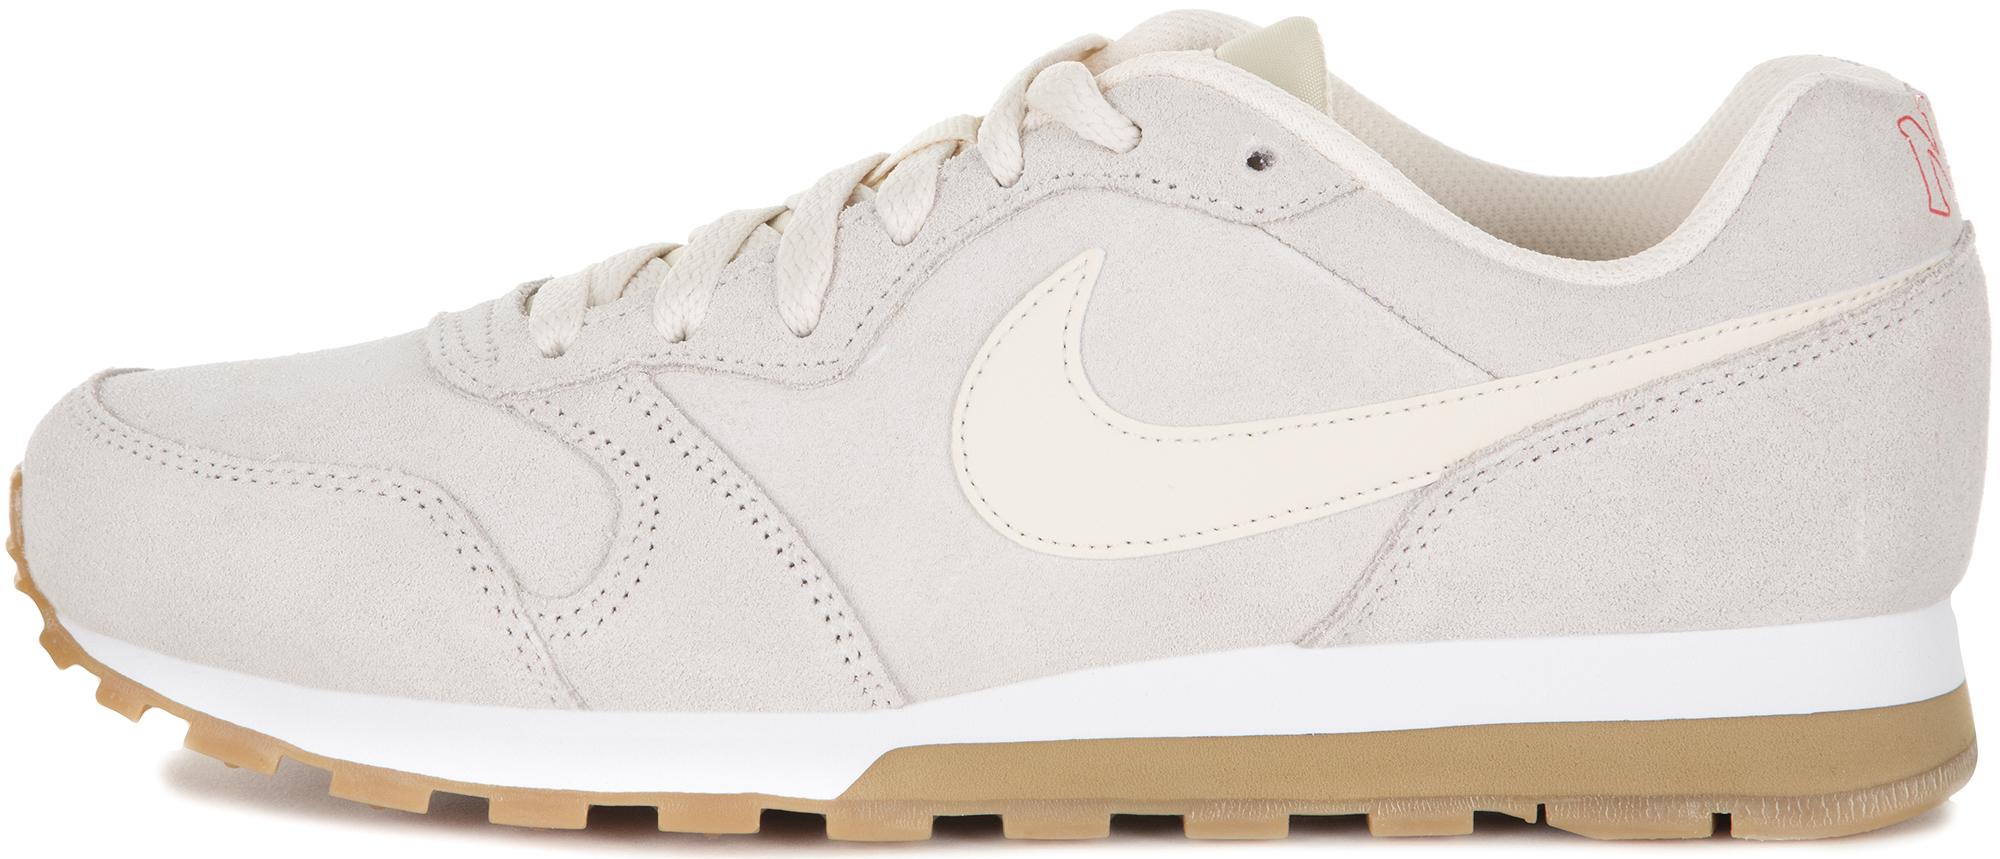 Nike Кроссовки женские Nike MD Runner 2 SE, размер 37,5